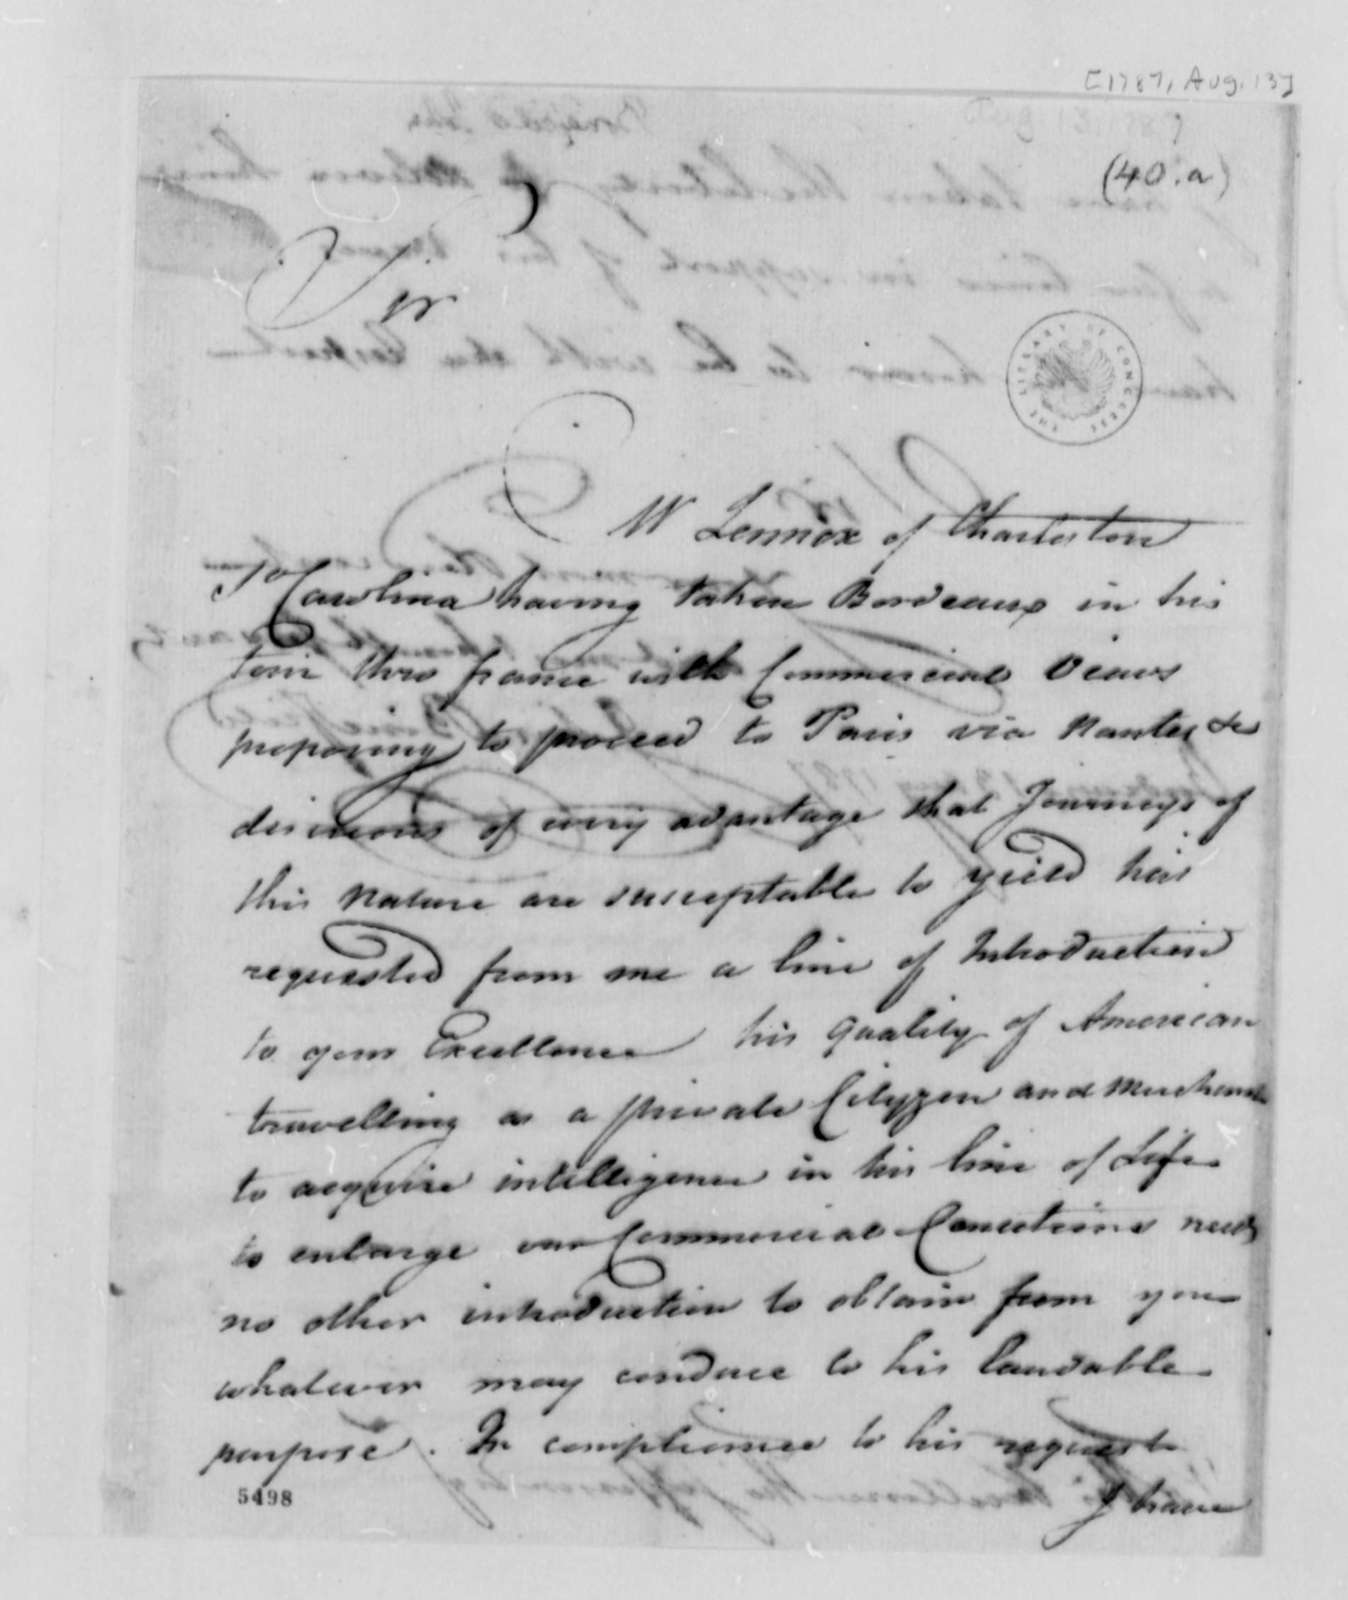 John Bondfield to Thomas Jefferson, August 13, 1787